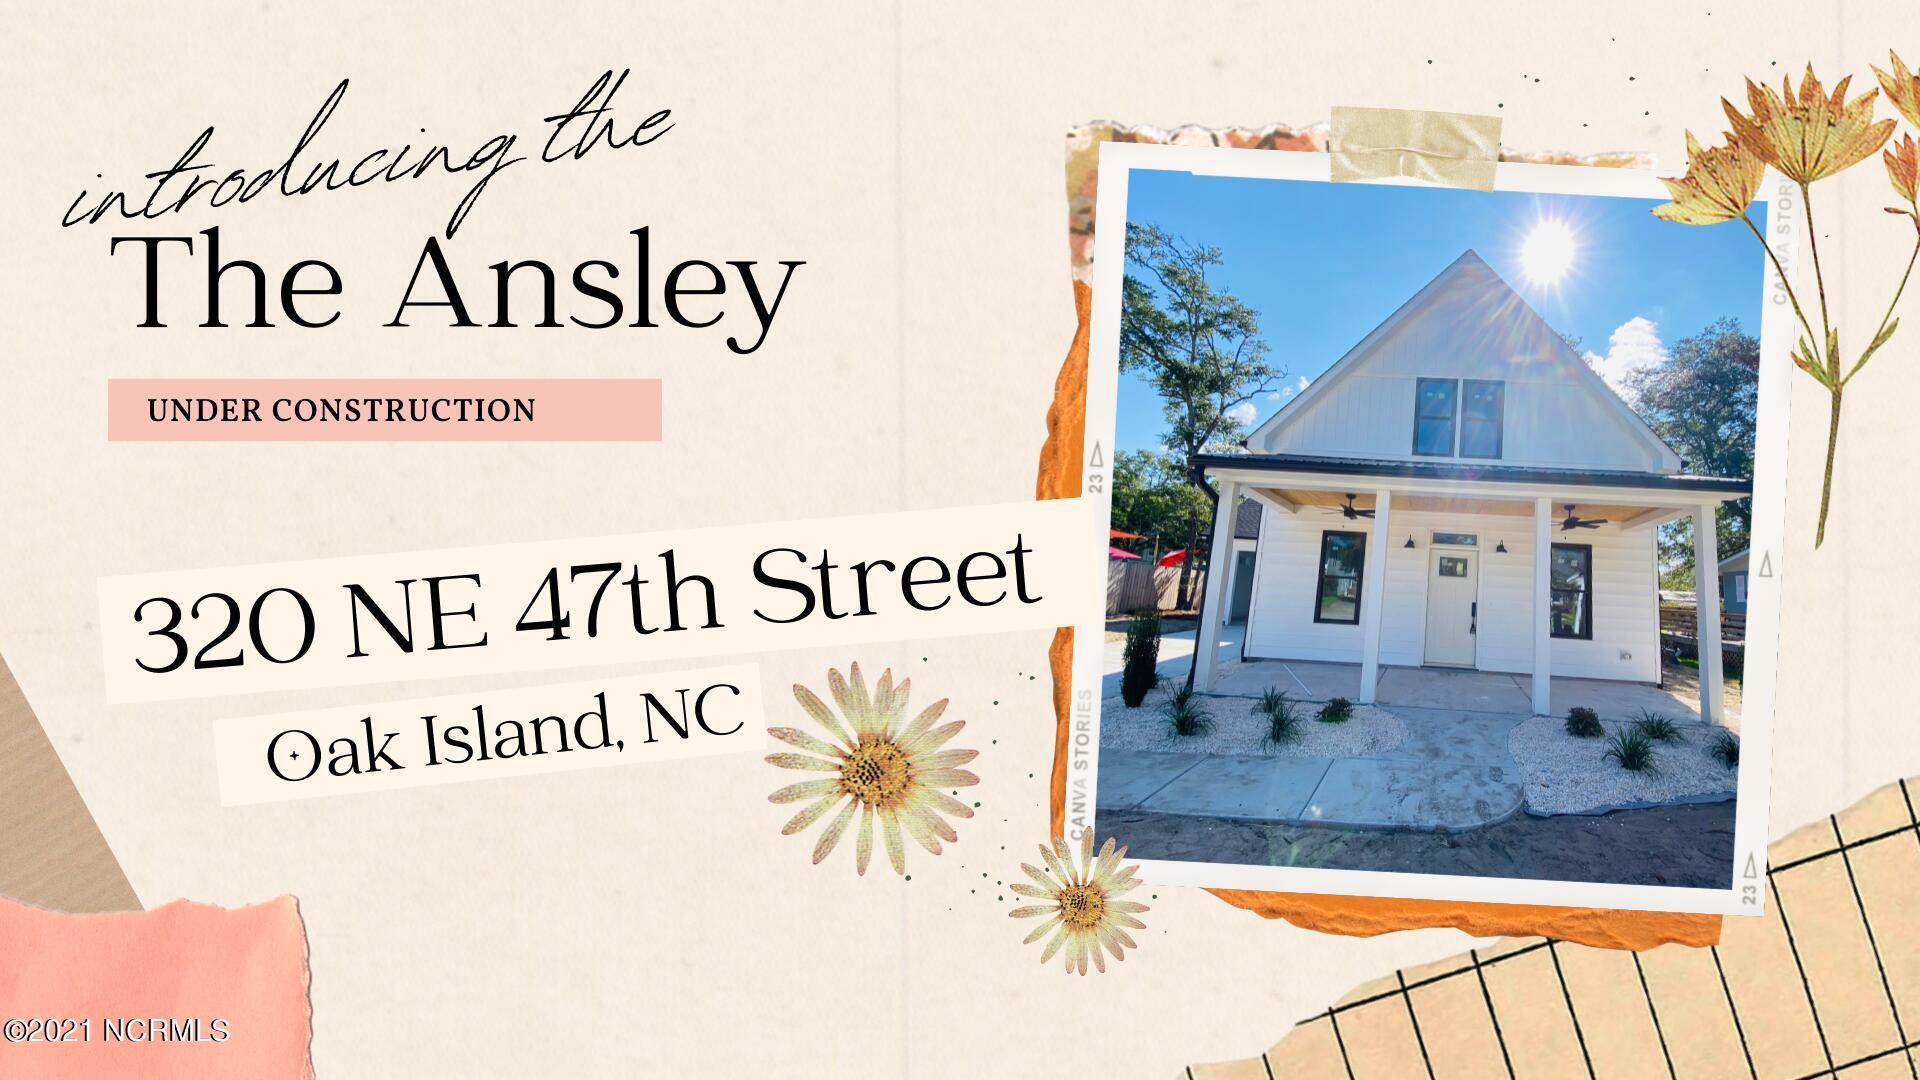 320 NE 47th Street Oak Island, NC 28465